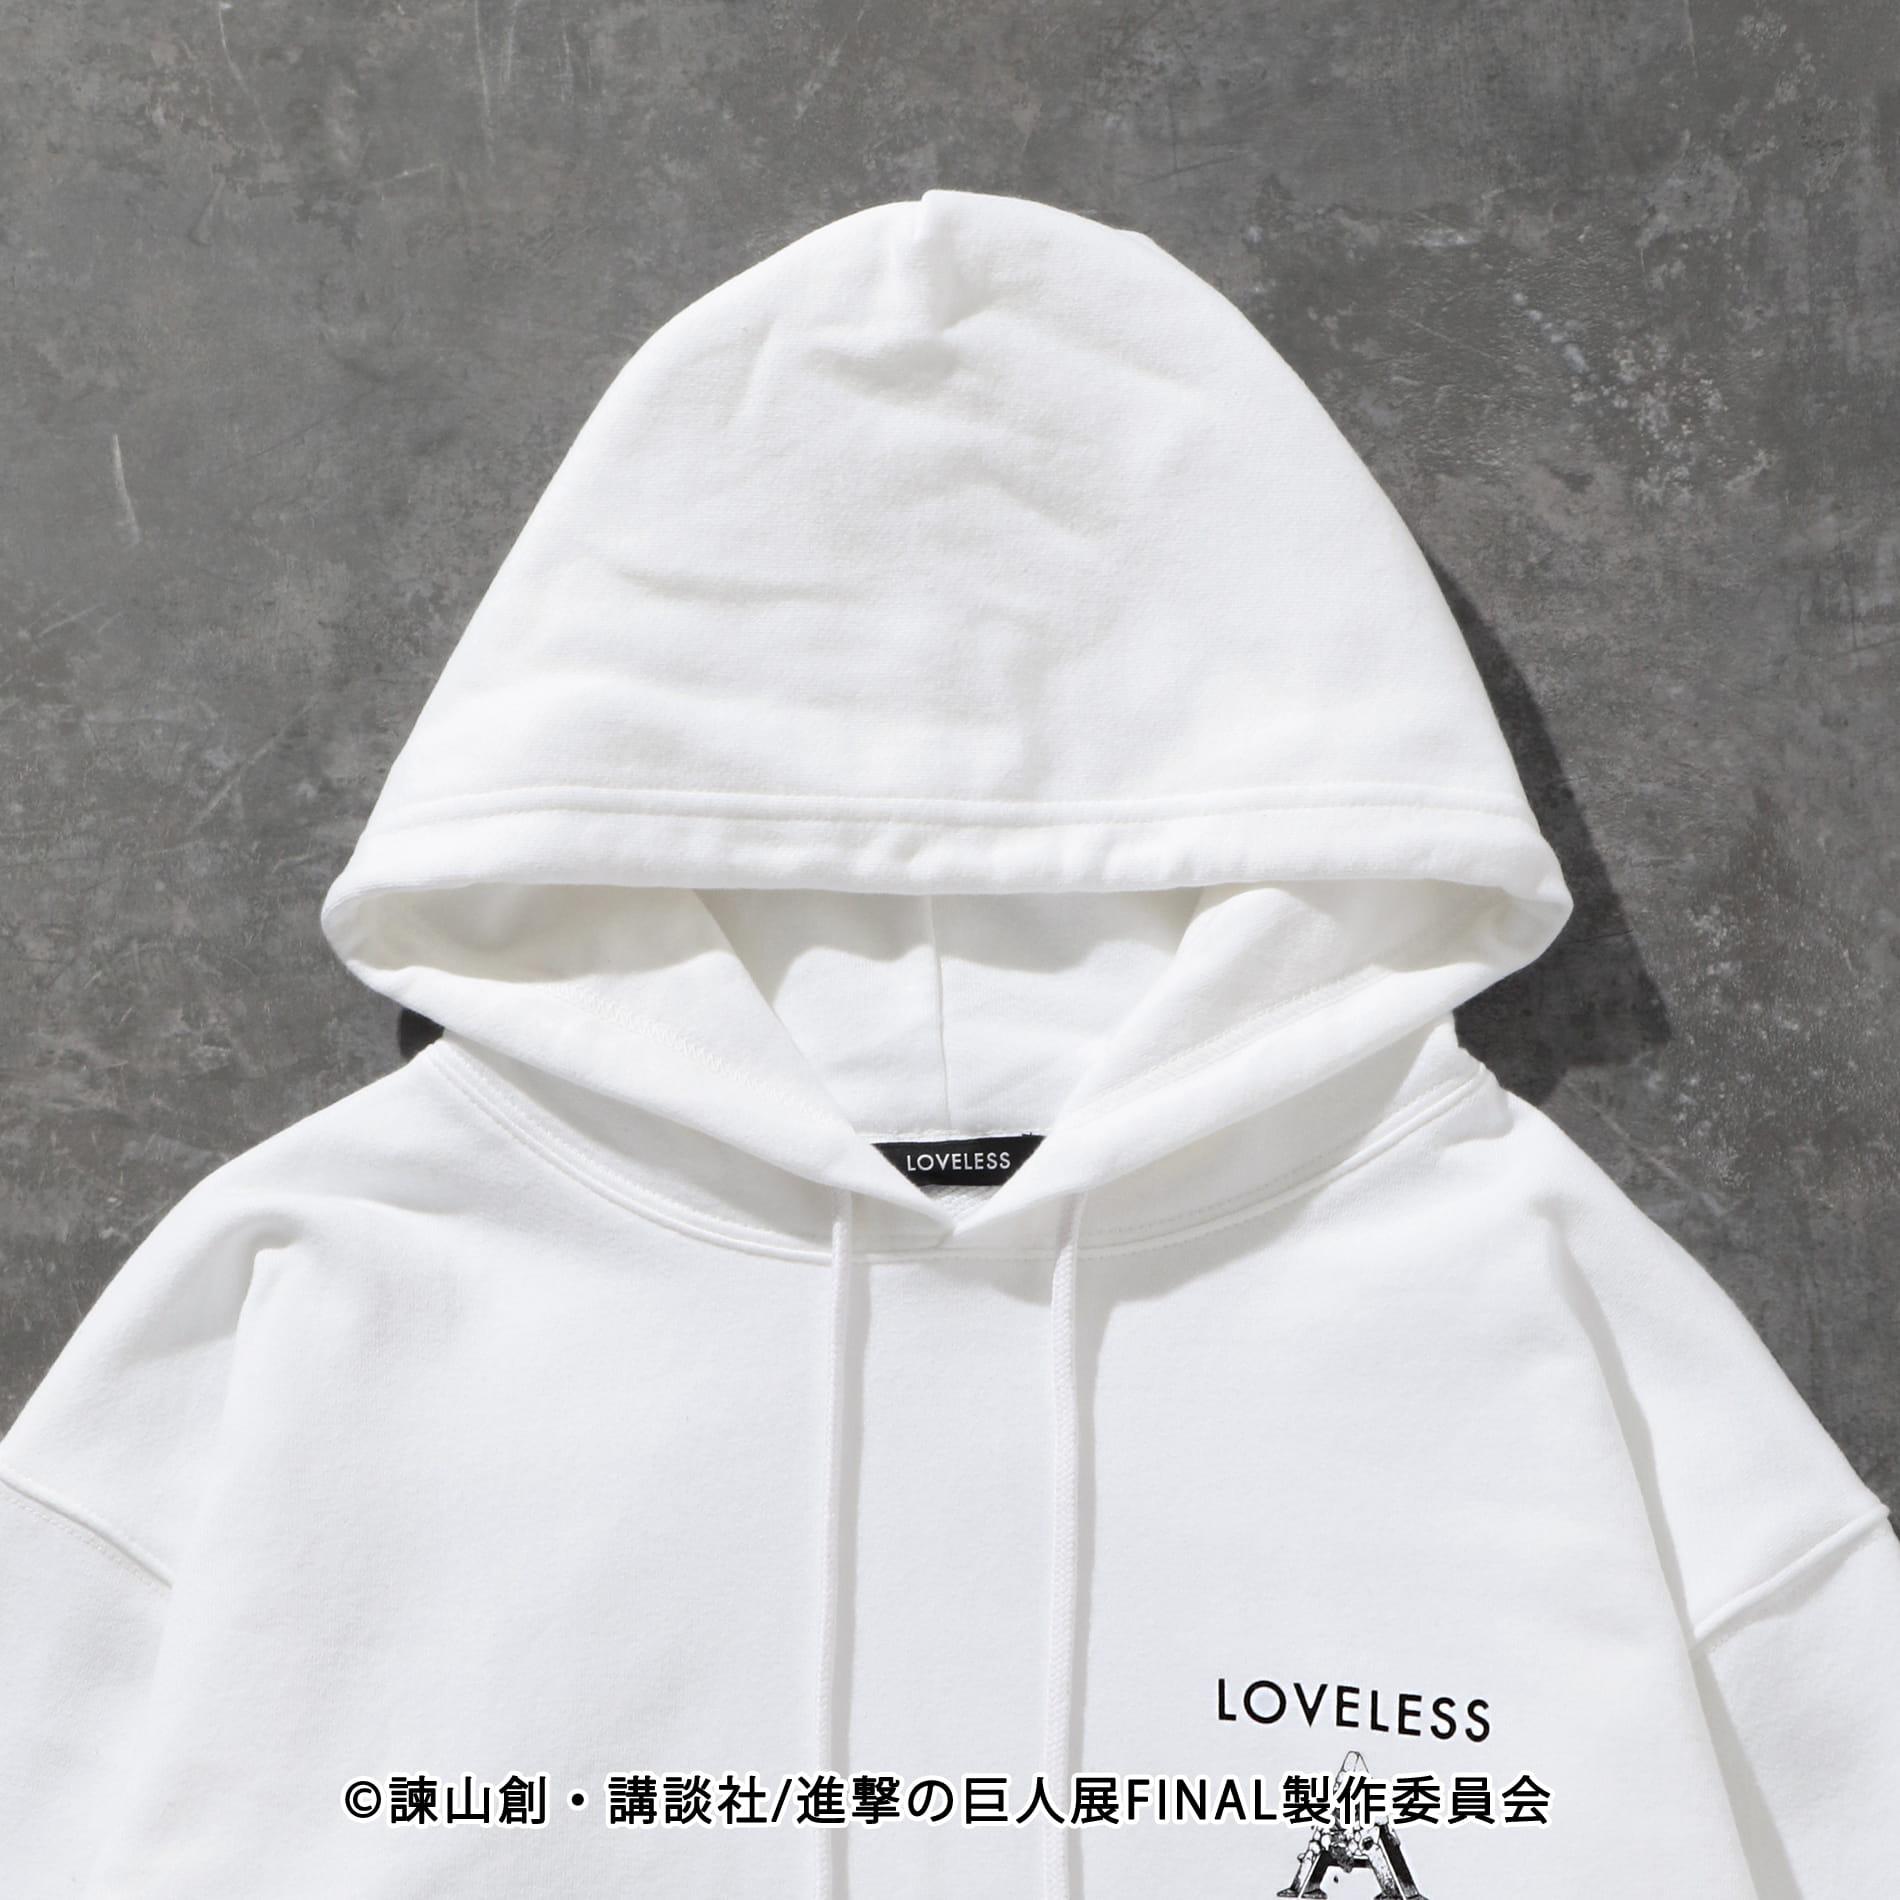 【LOVELESS×進撃の巨人】ミカサ・アッカーマン コラボ フーディー